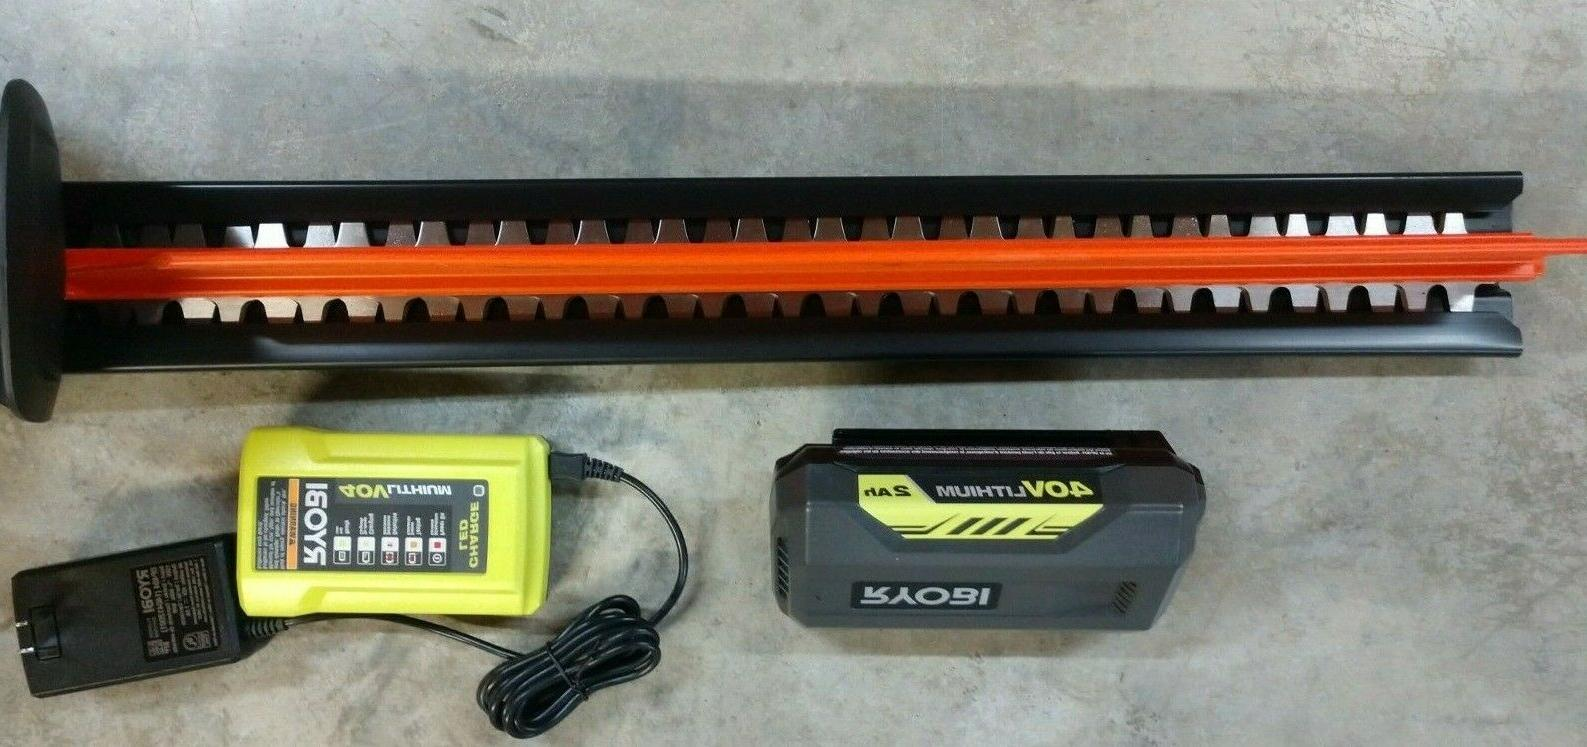 "RYOBI 24"" Trimmer Battery & RY40602"